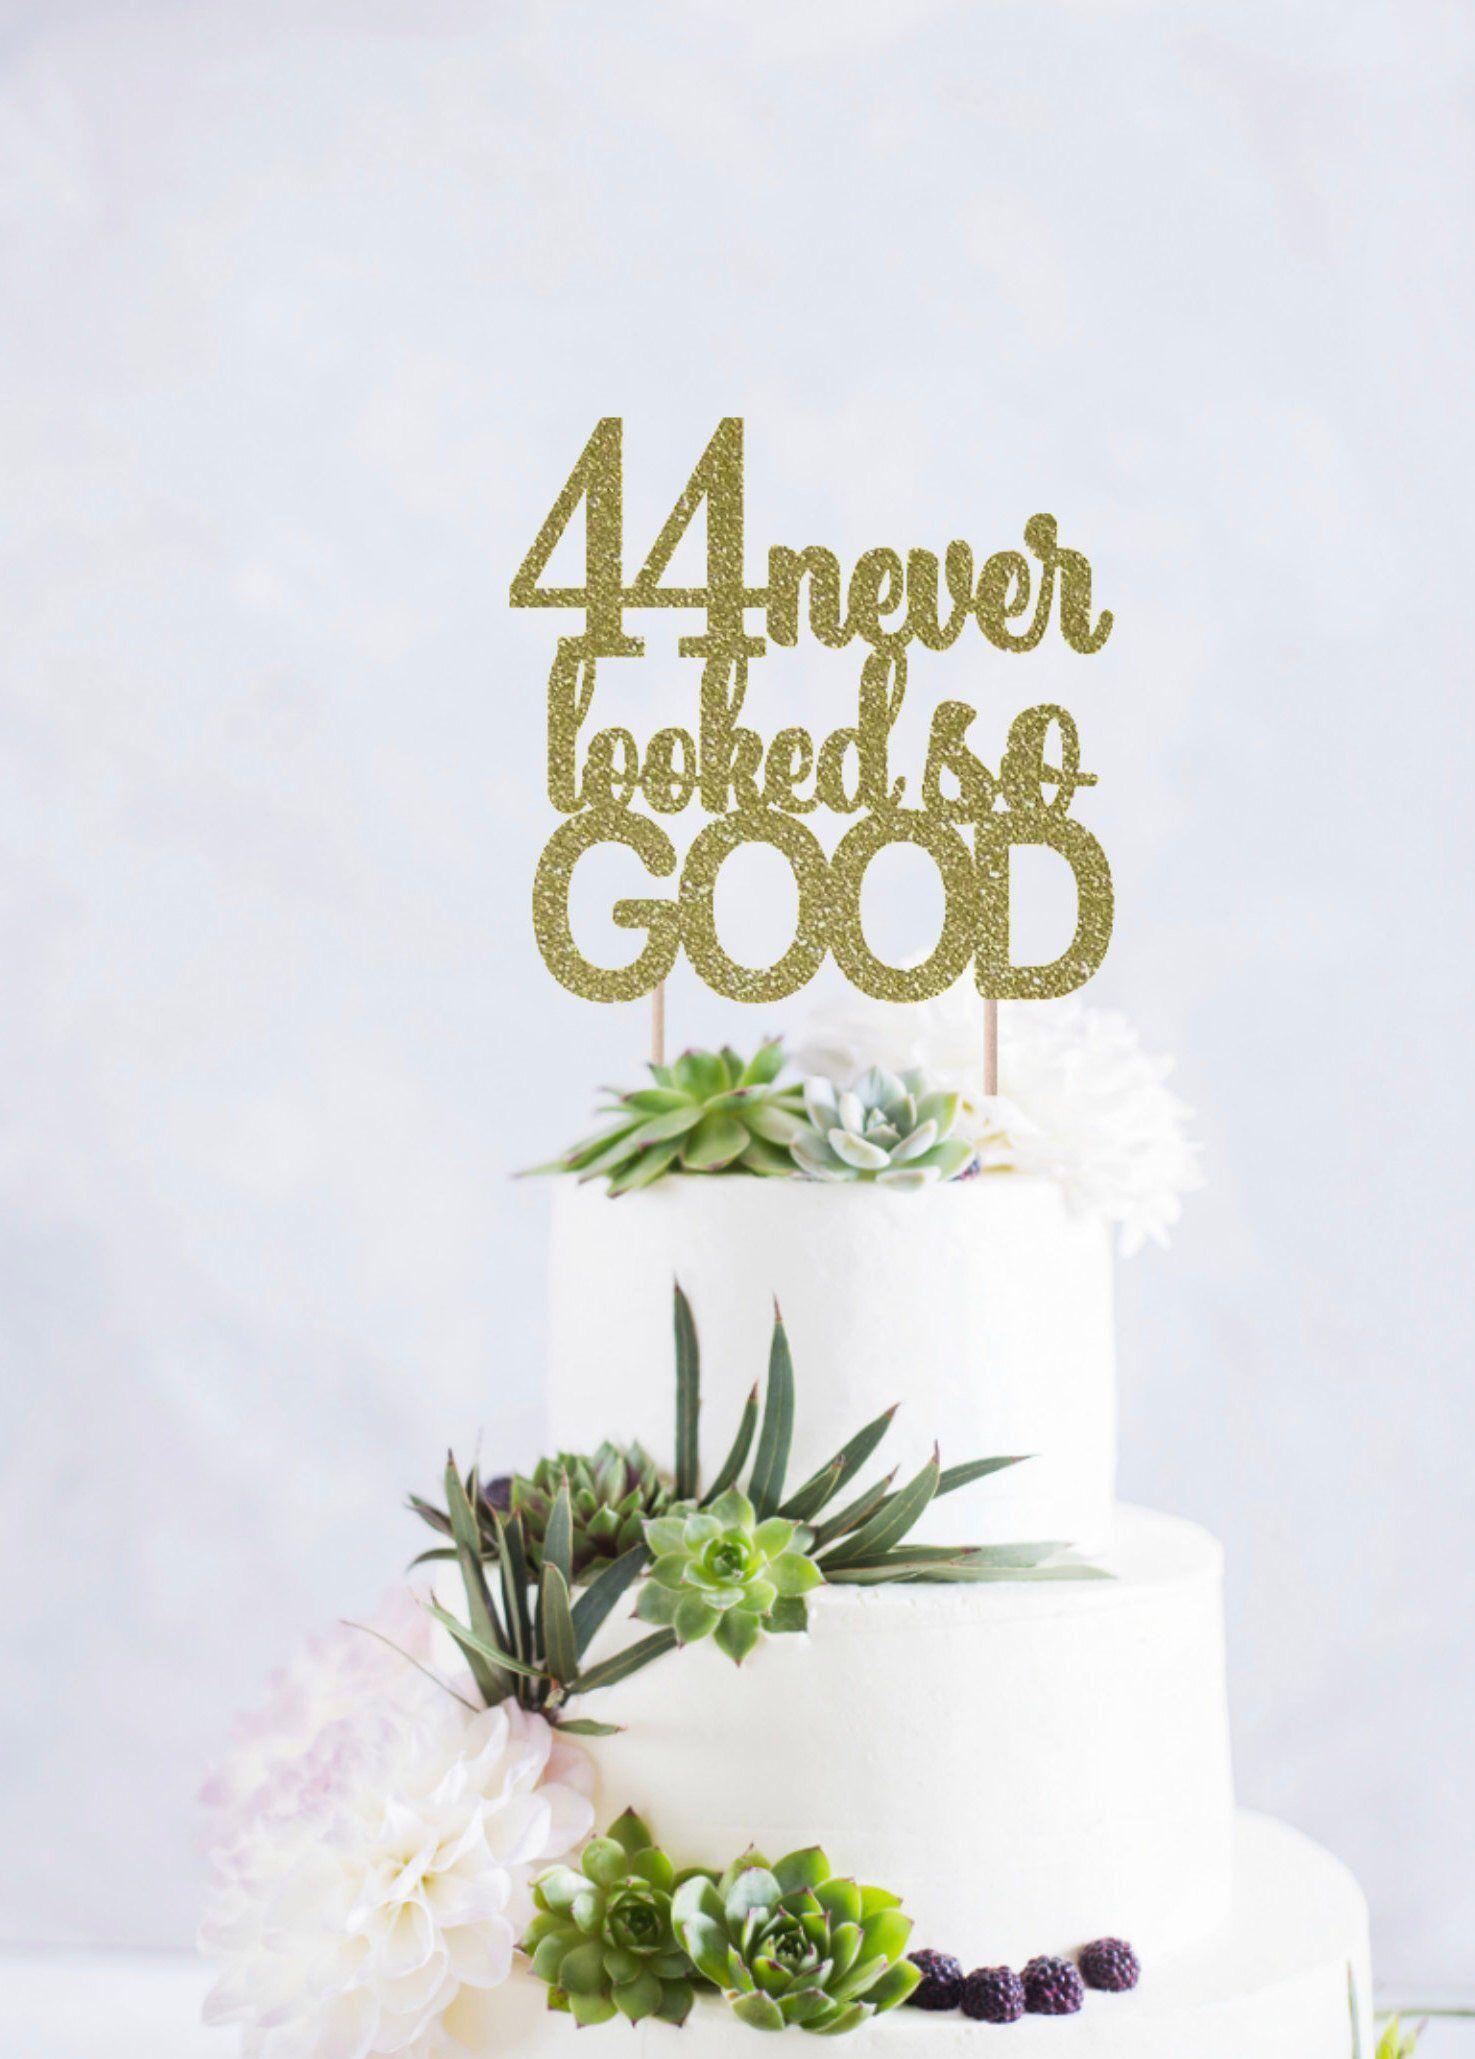 Awe Inspiring 44Th Birthday Cake Topper 44 Never Looked So Good 44Th Birthday Personalised Birthday Cards Petedlily Jamesorg